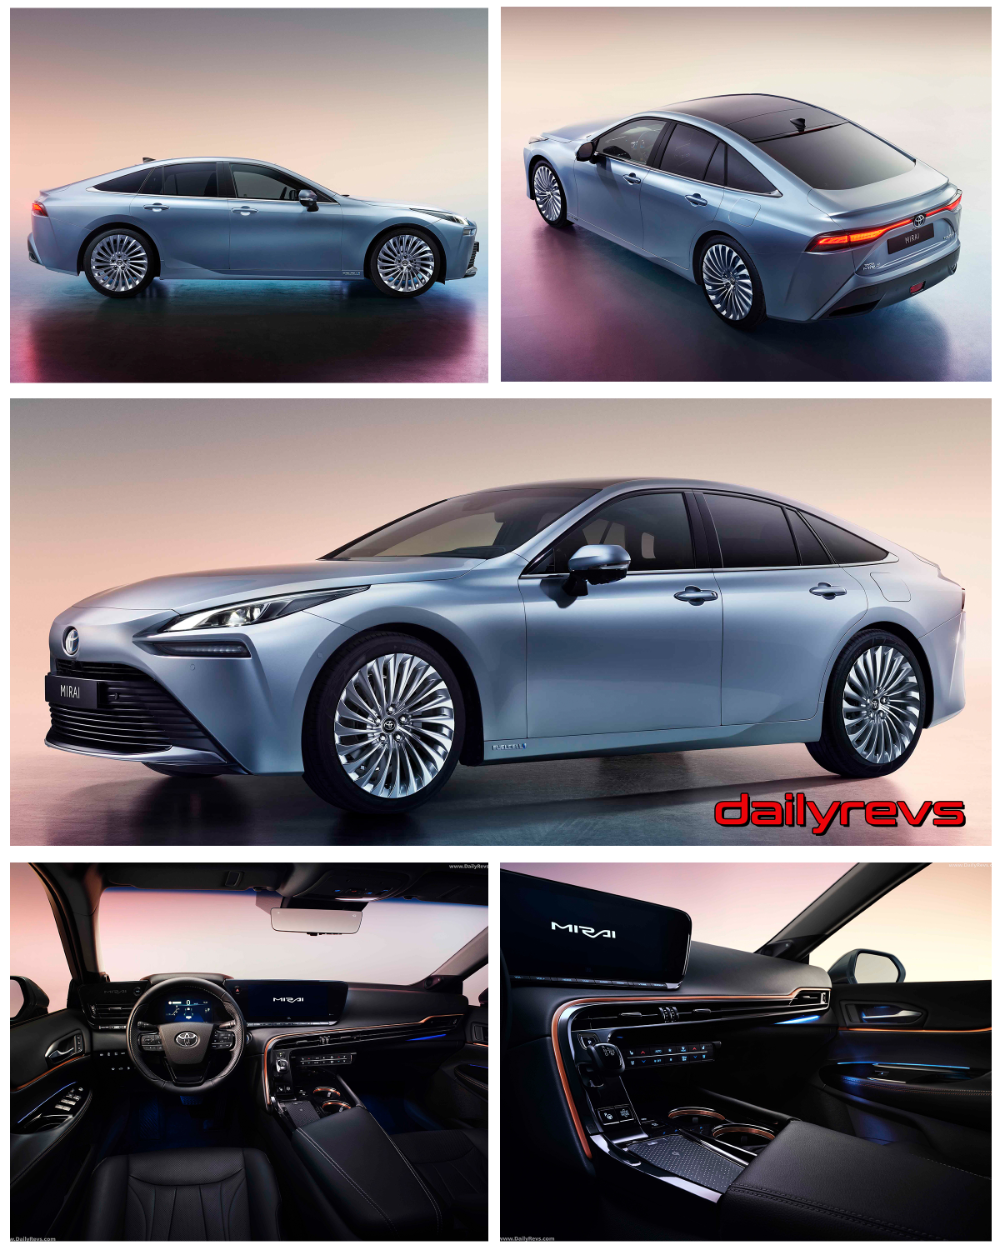 2020 Toyota Mirai HD Pictures, Videos, Specs